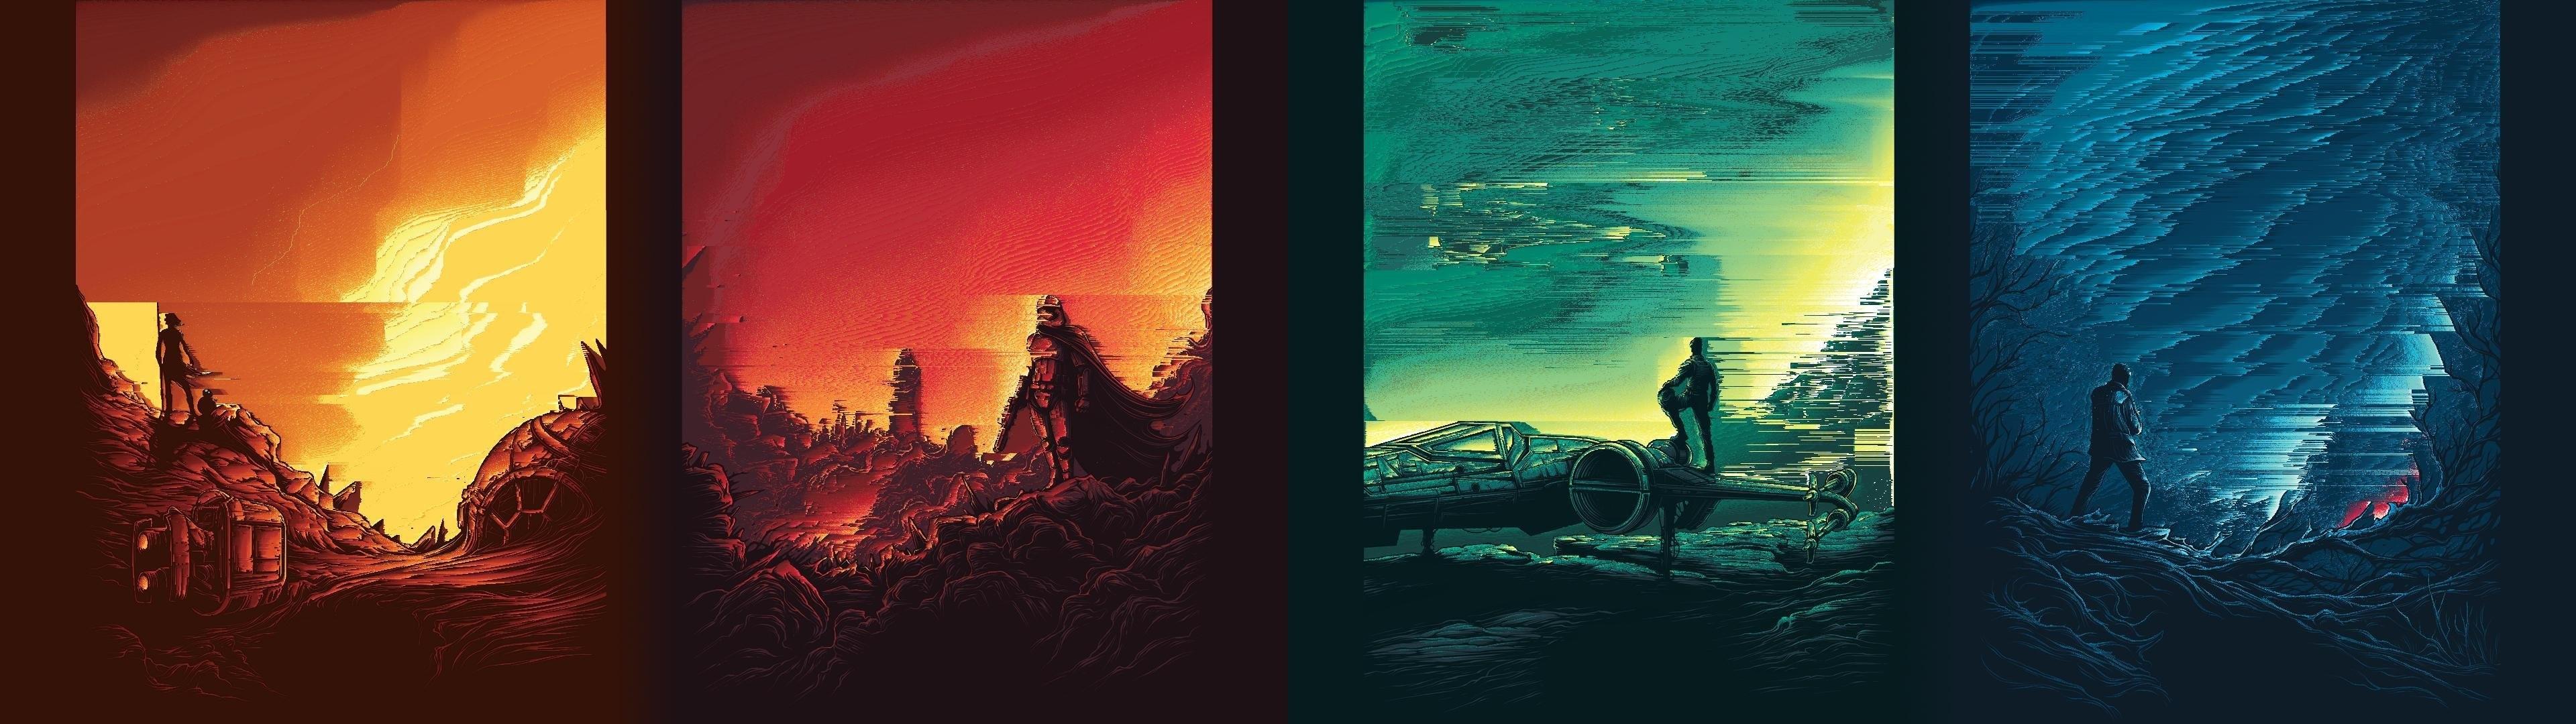 42 Triple Monitor Wallpaper Star Wars